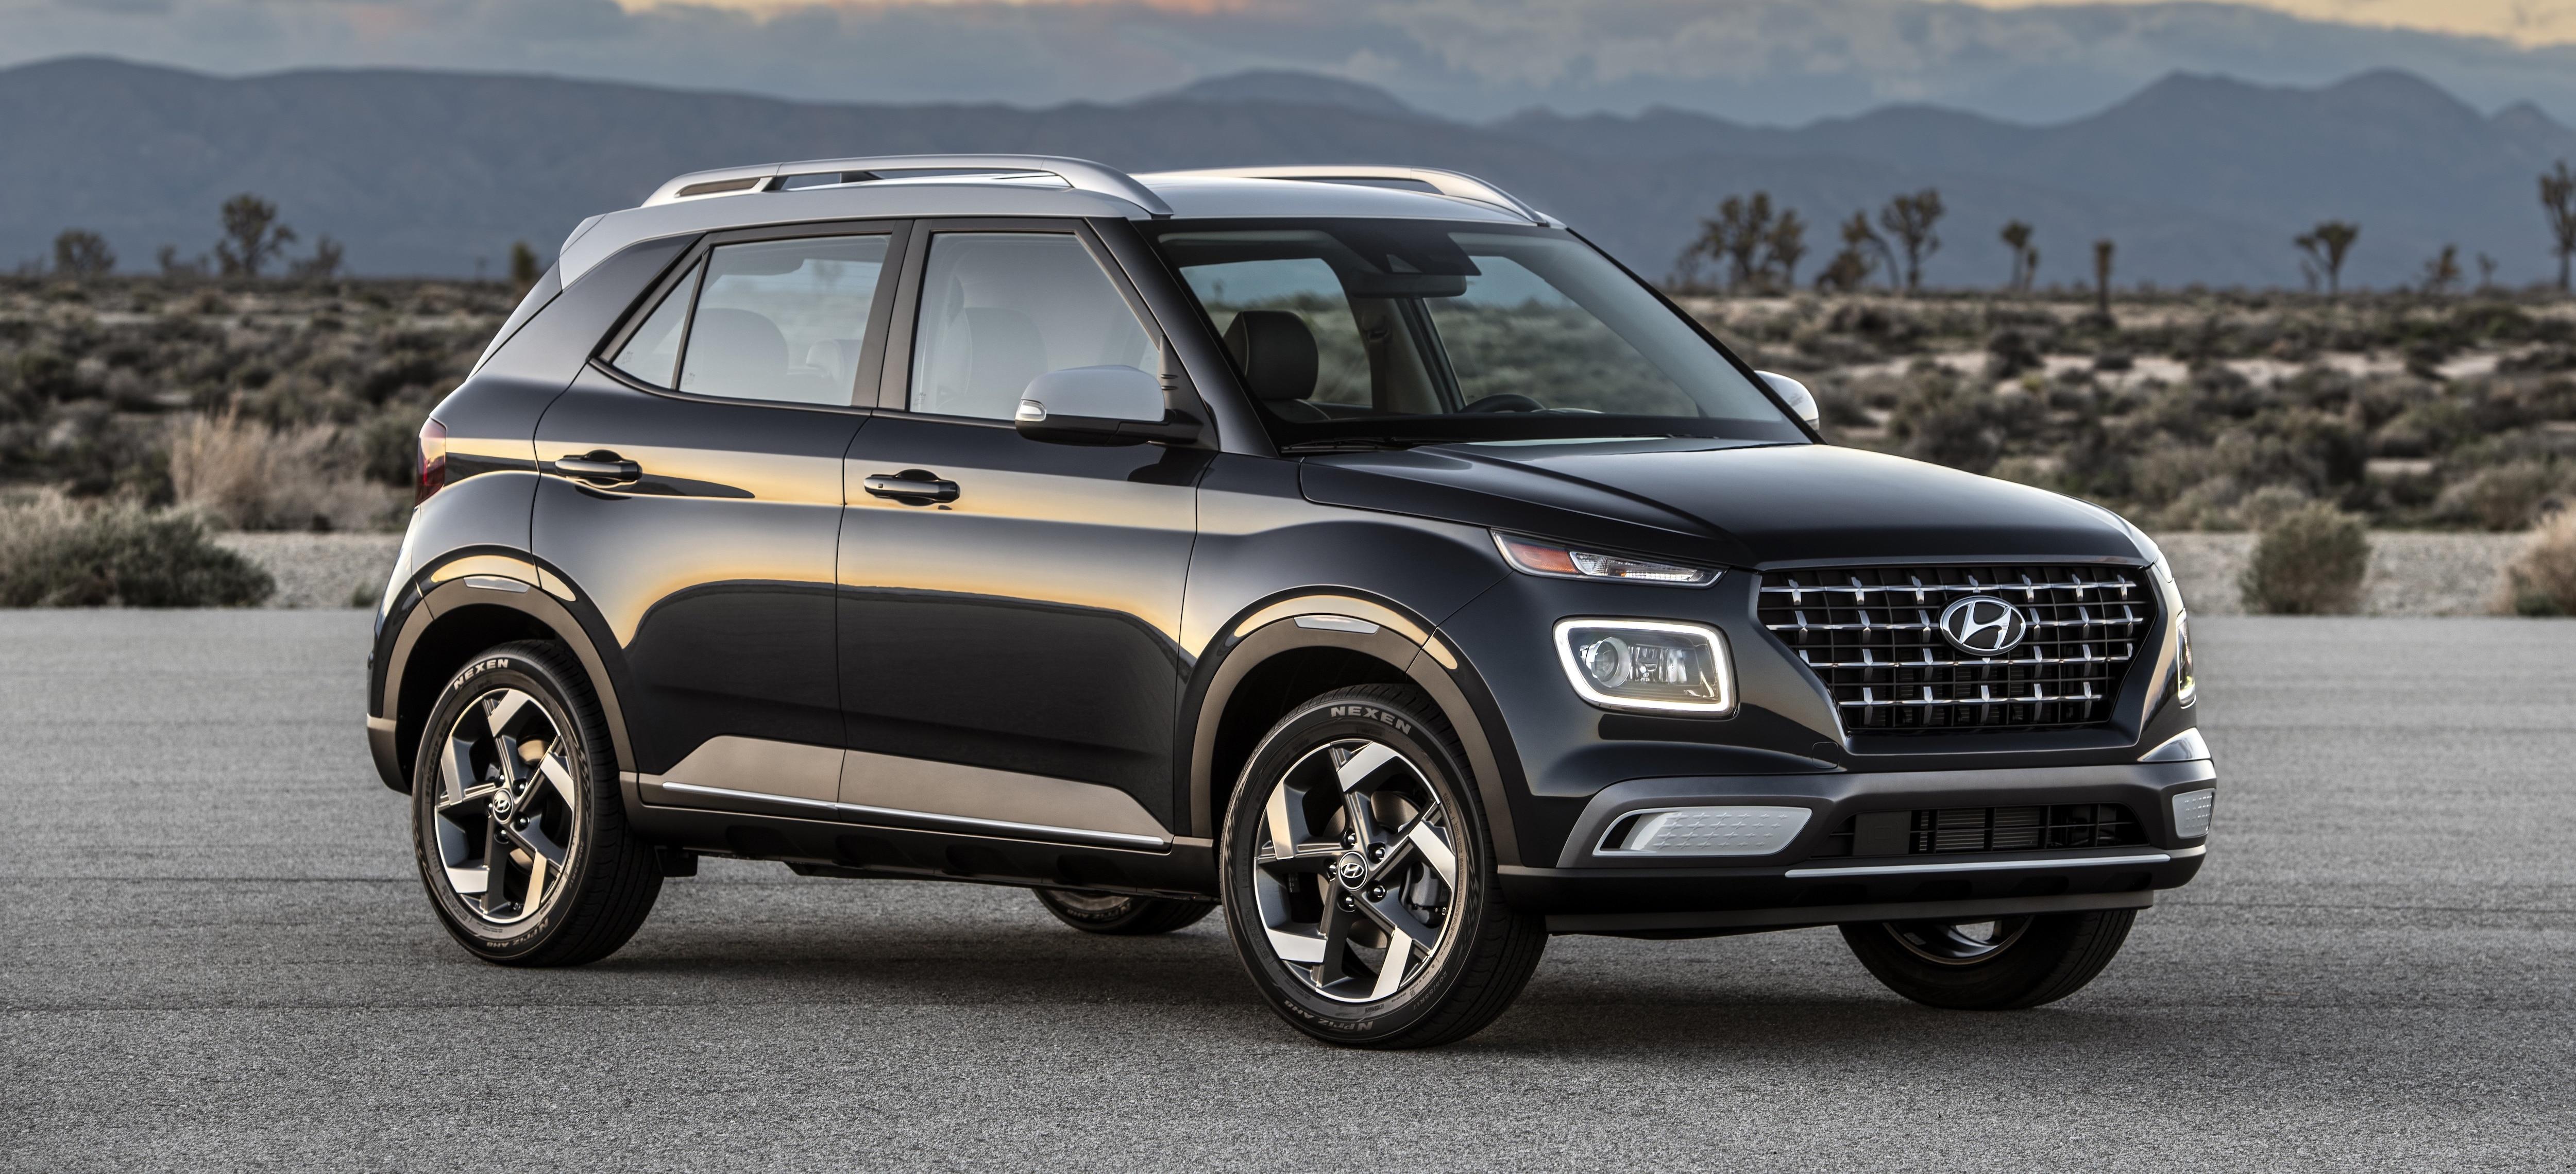 2020 Hyundai Venue: A New Entry-Level Crossover SUV ...